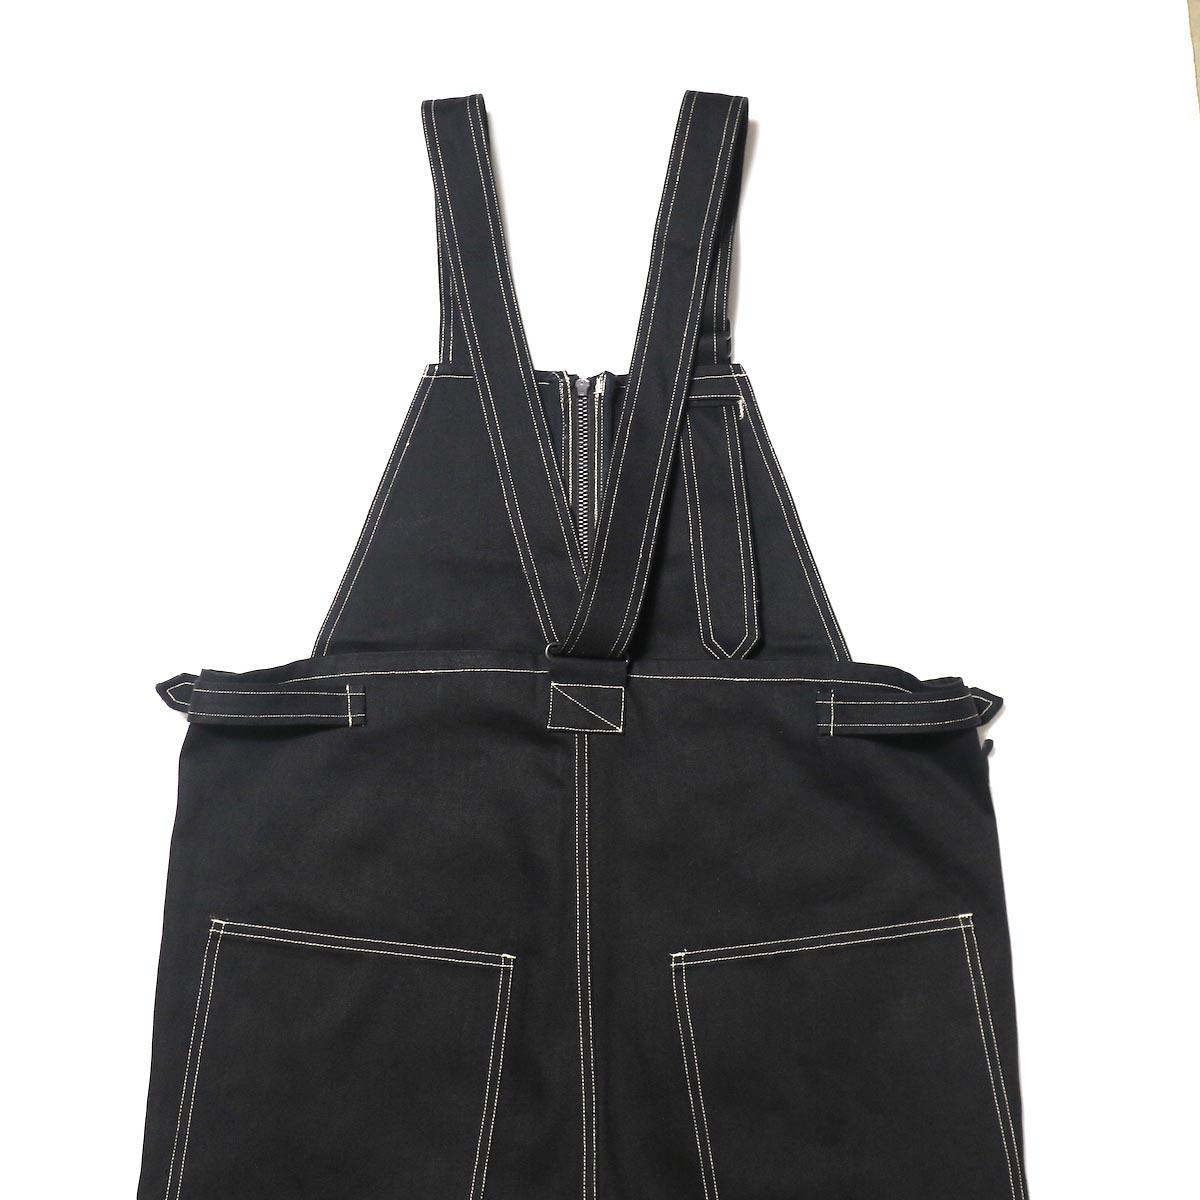 blurhms / U.S Cotton Denim Overalls (Black)背面詳細